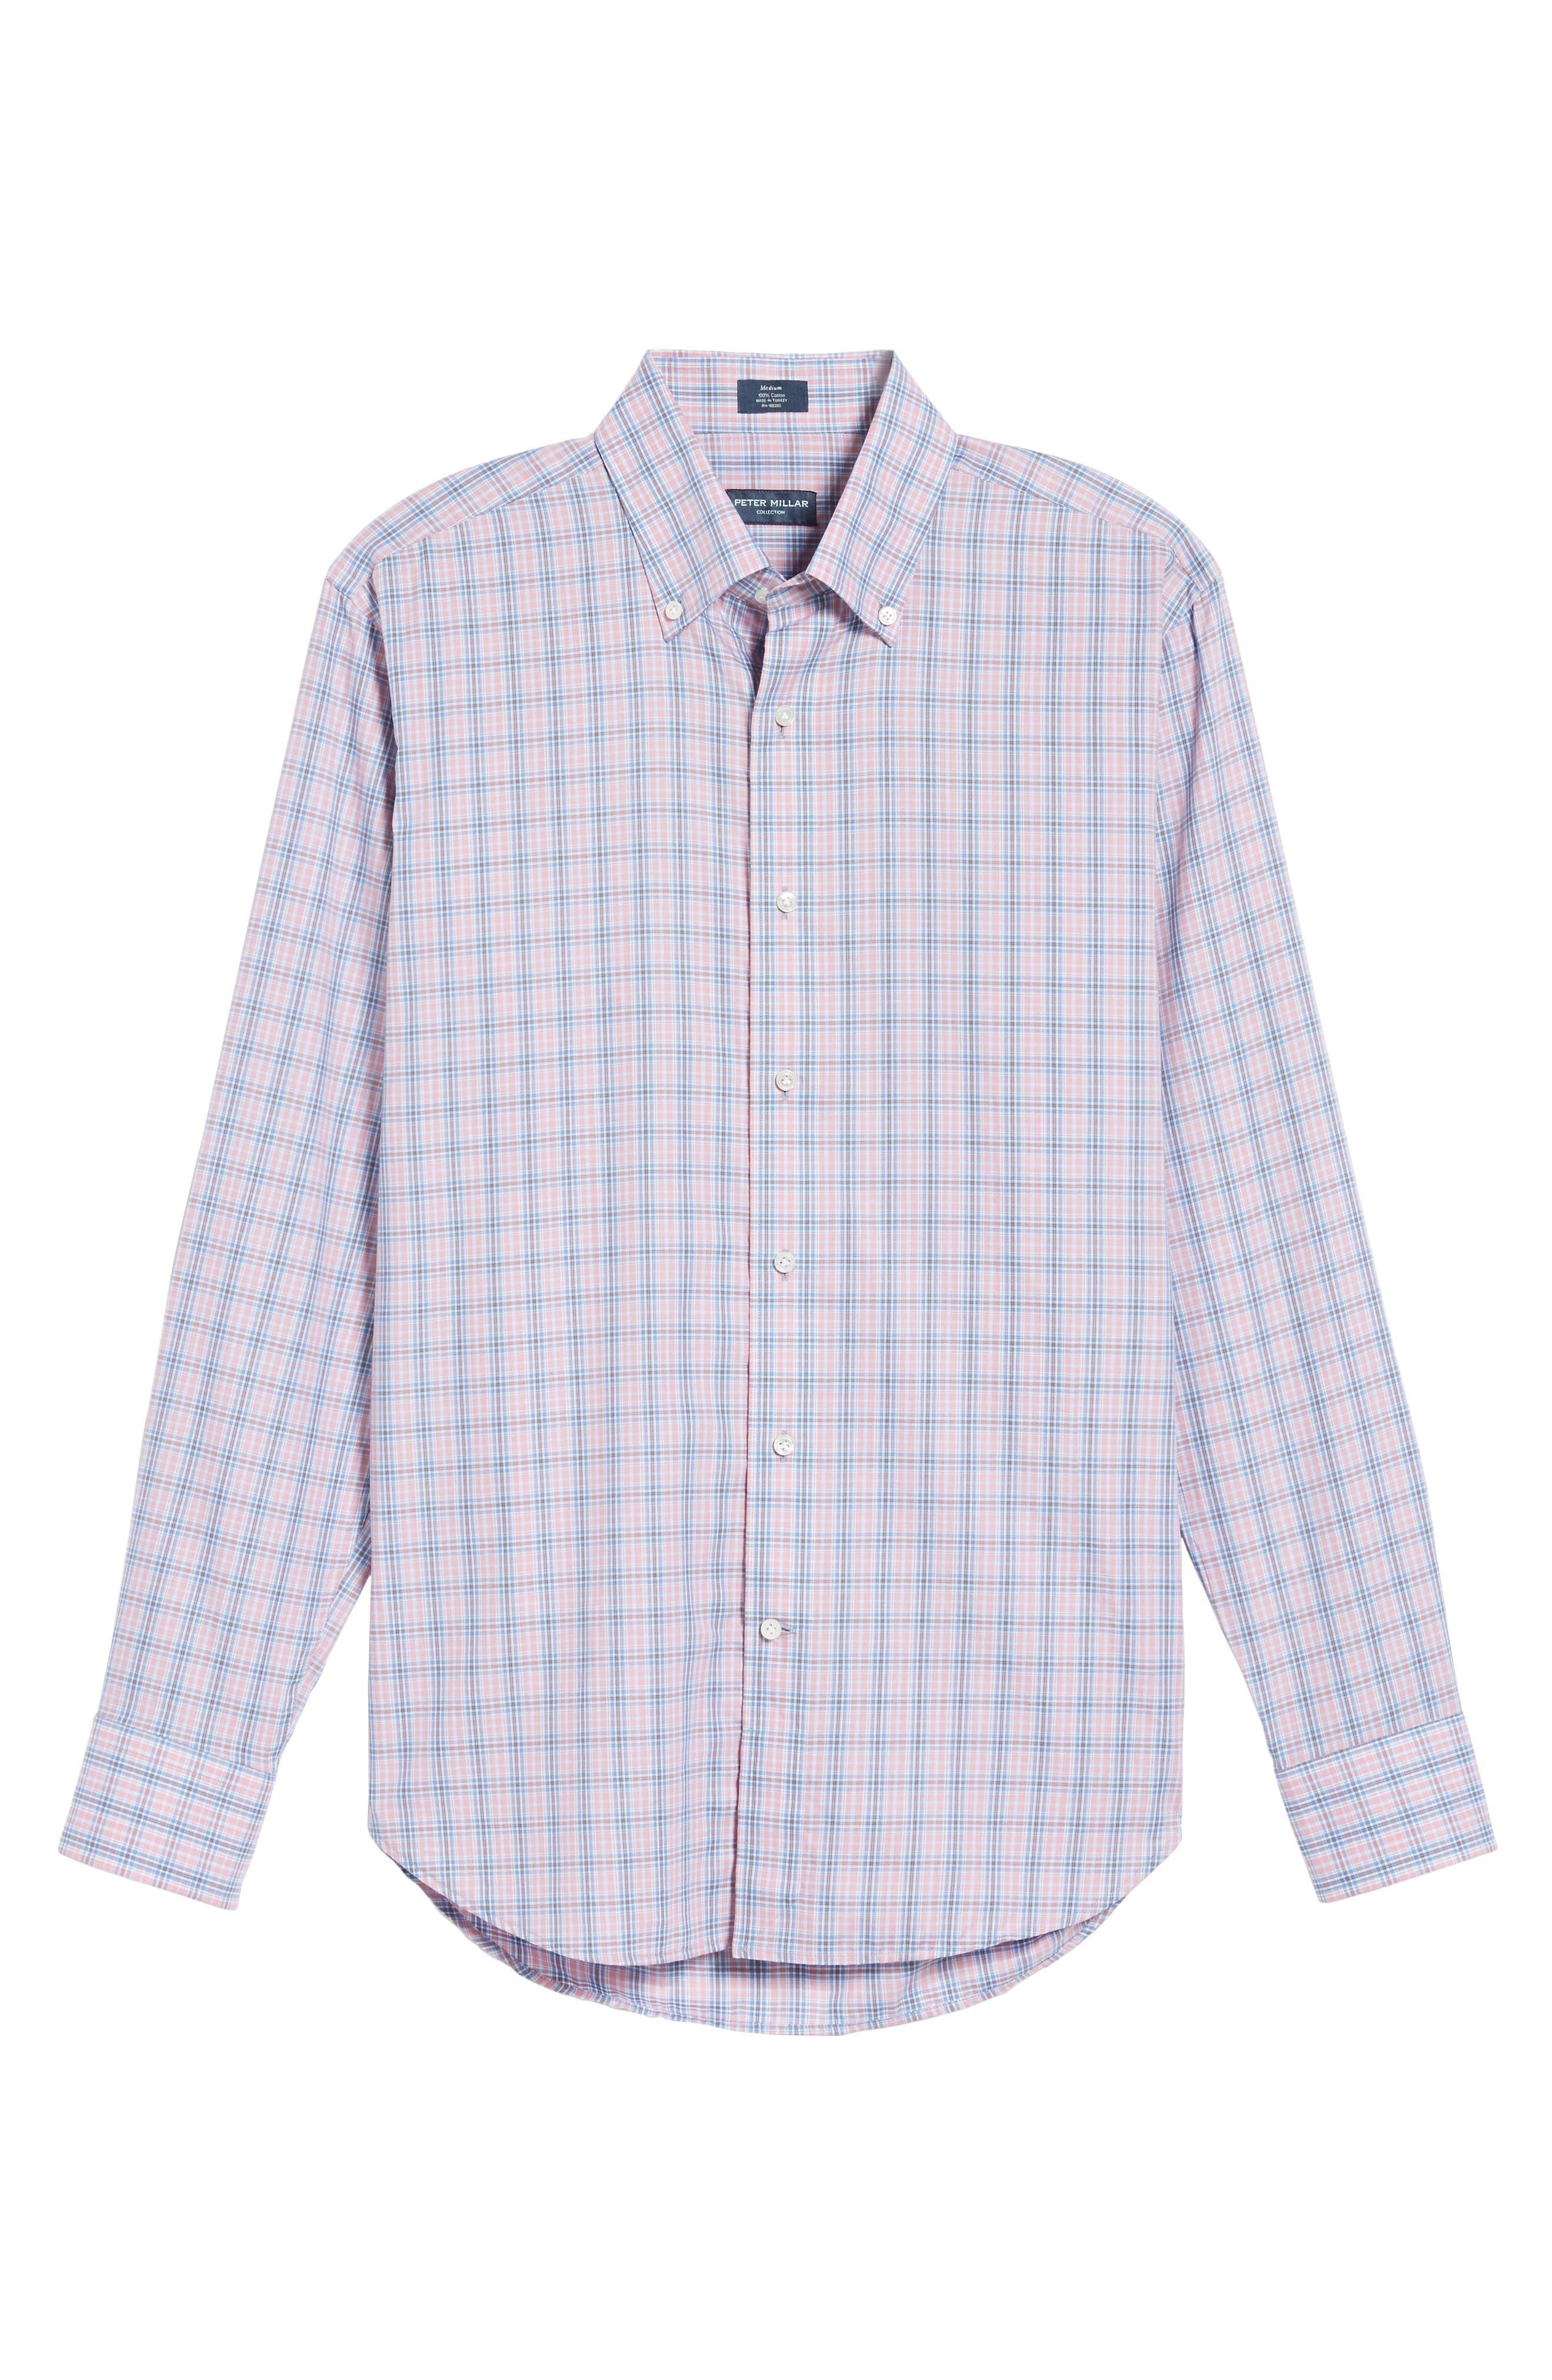 Peter Millar Desert Check Regular Fit Sport Shirt,                             Alternate thumbnail 6, color,                             617